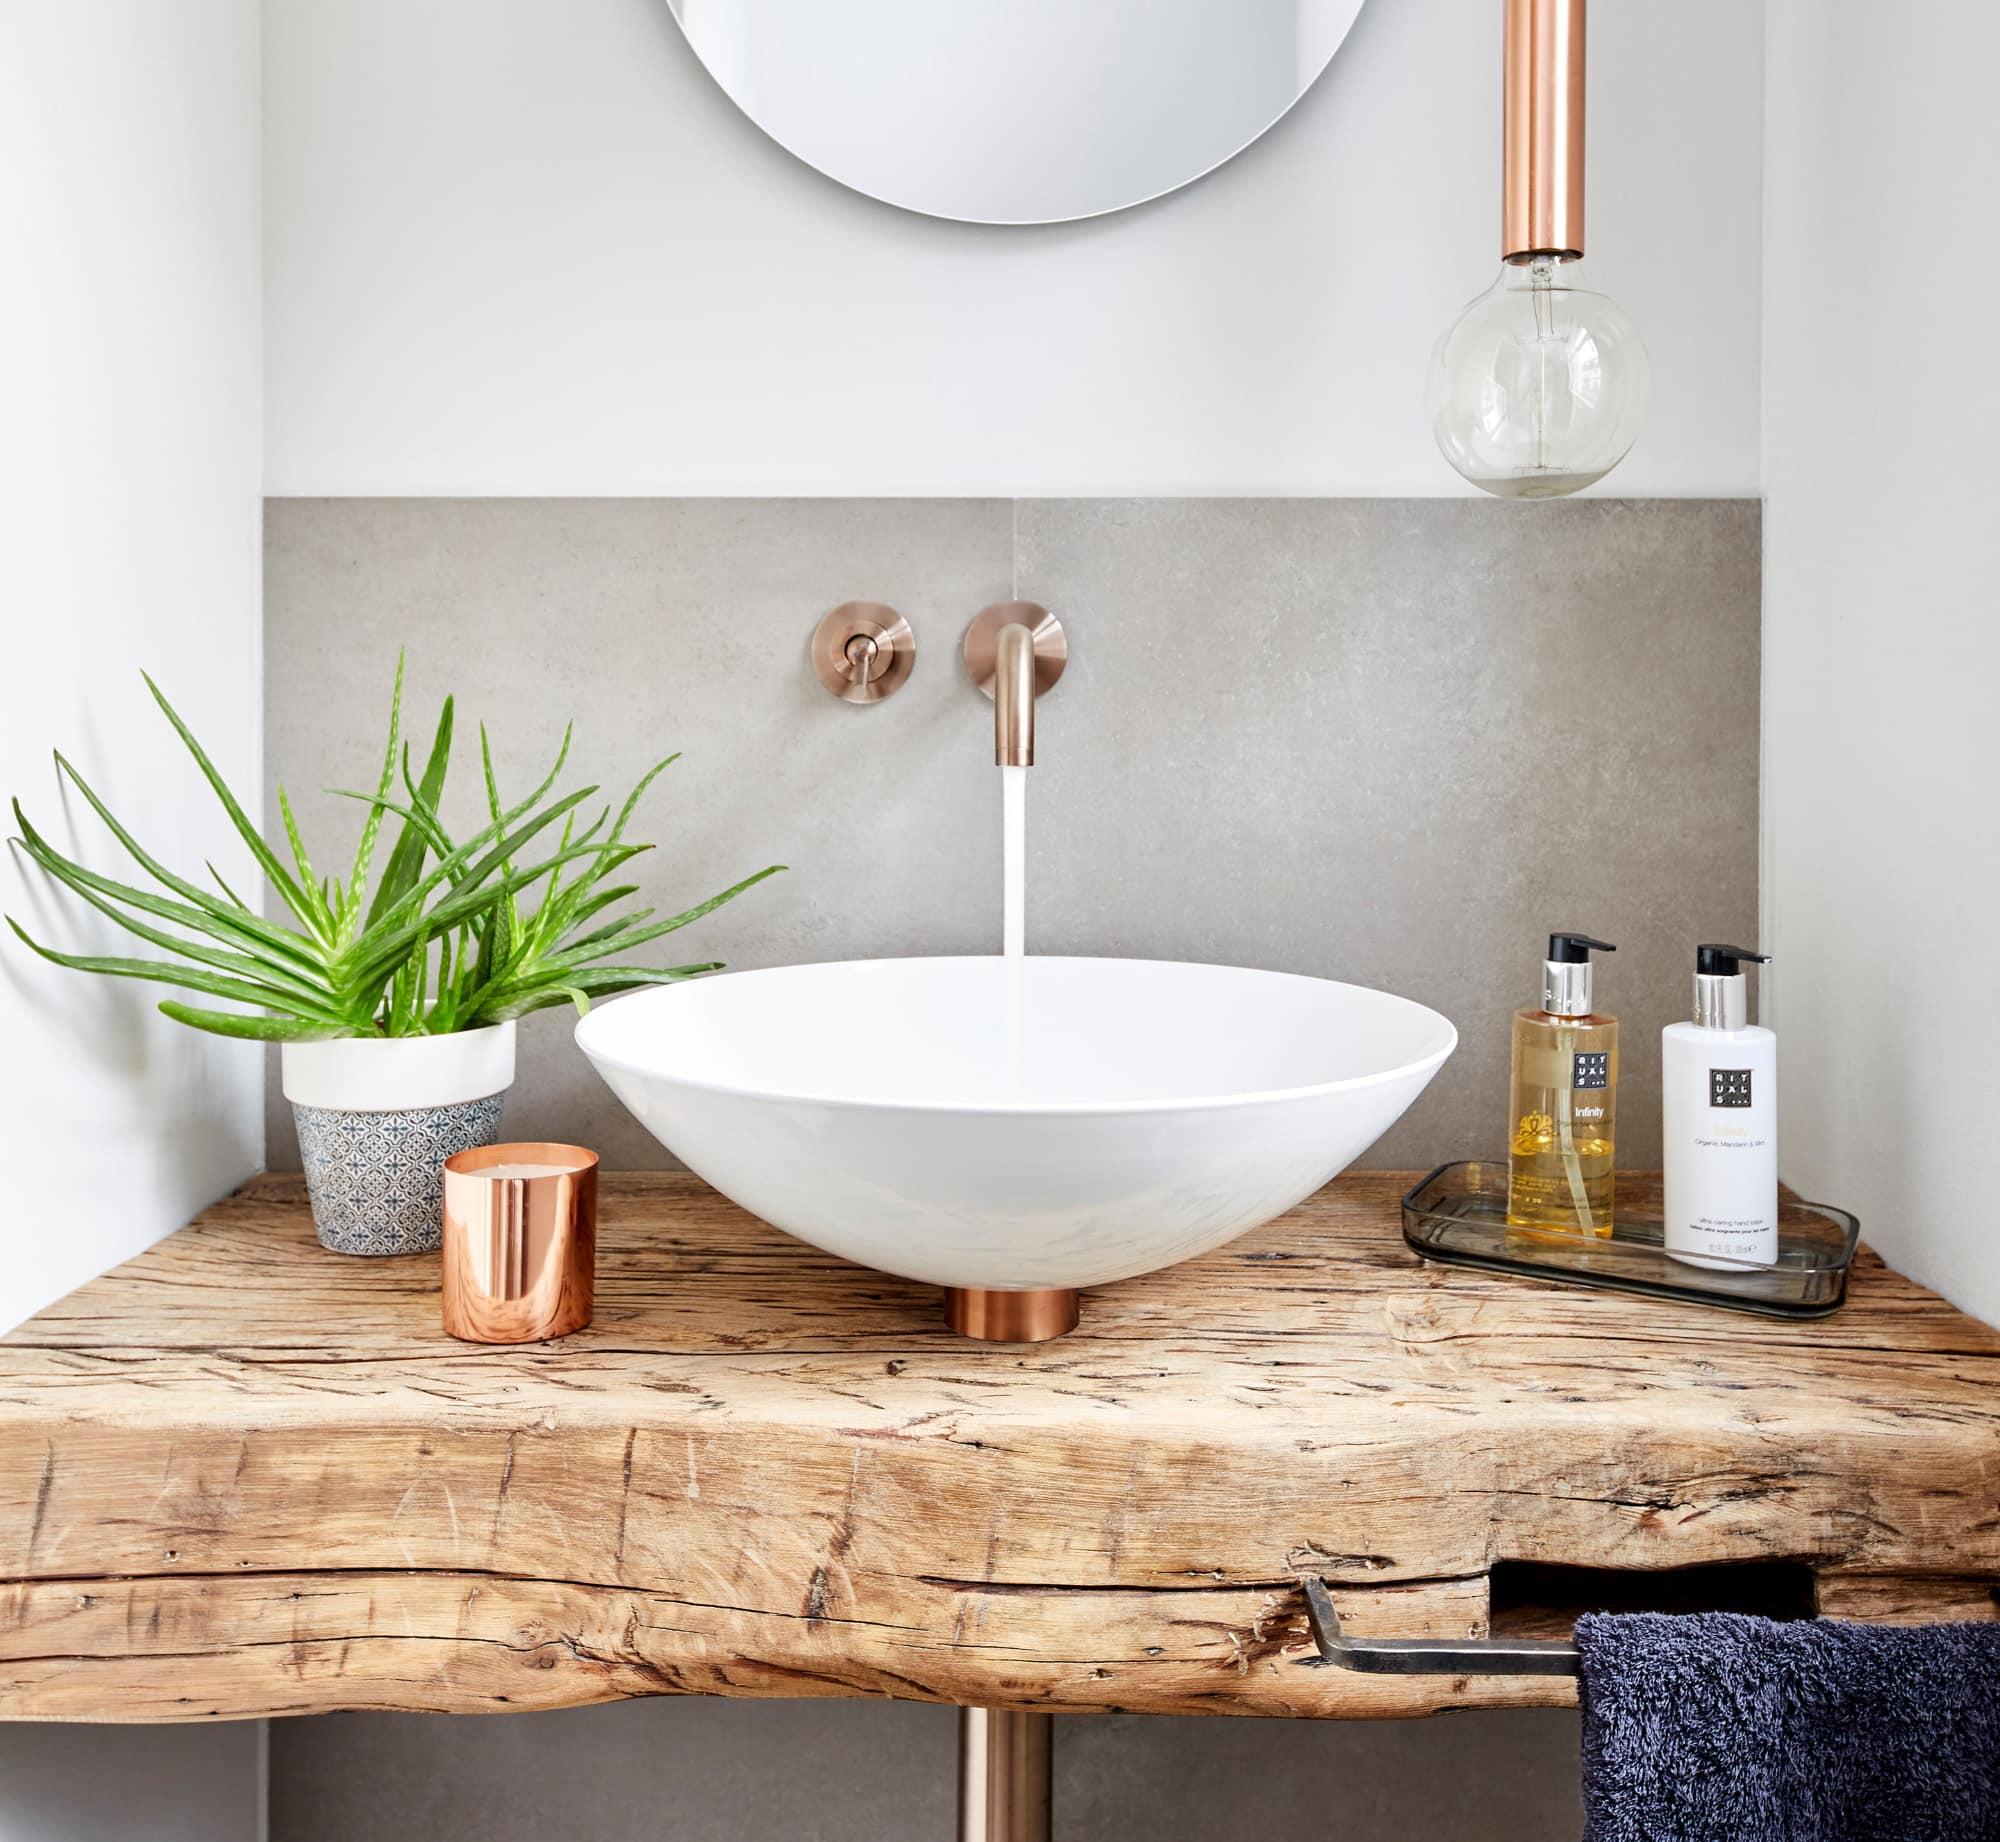 Waschtisch modern rustikal mit Holz - Ideen Inneneinrichtung Haus Design Baufritz STADTHAUS EHRMANN - HausbauDirekt.de